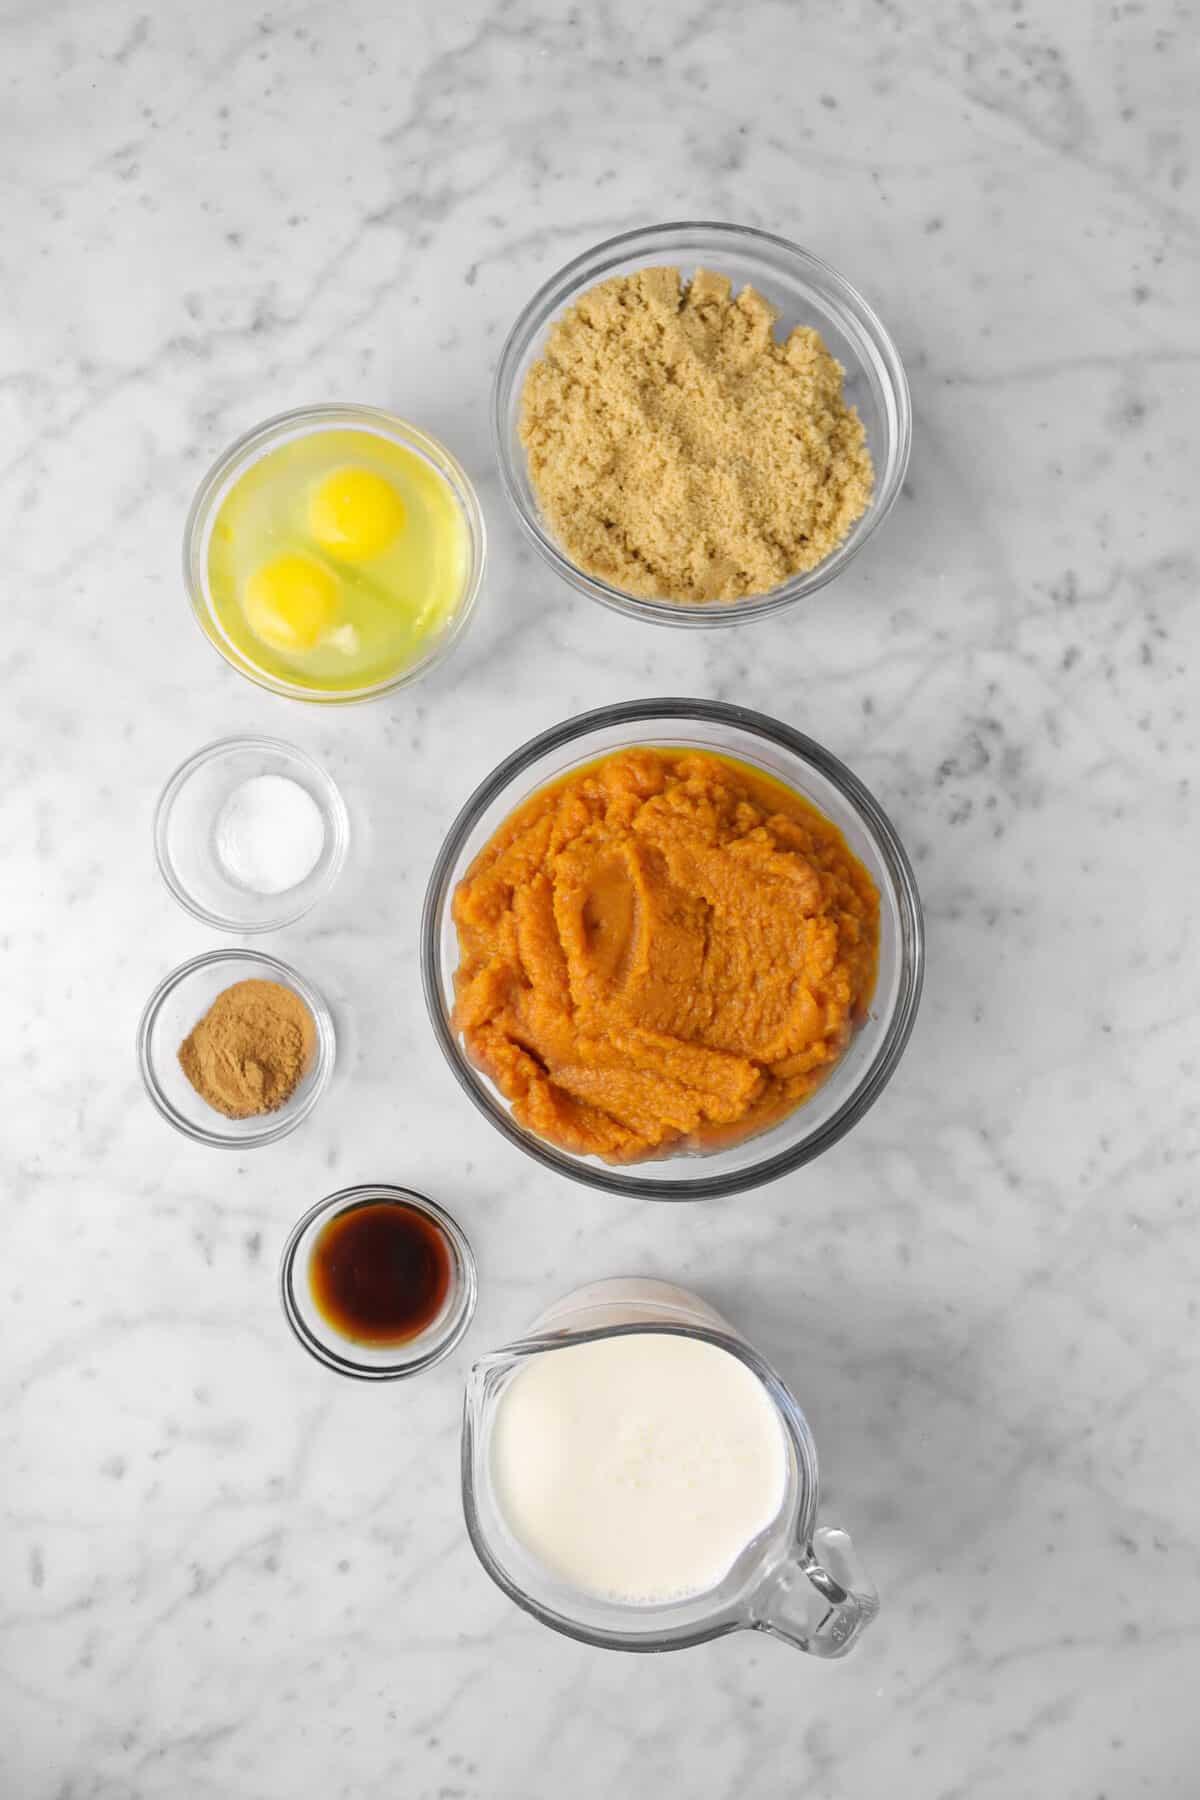 brown sugar, eggs, saly, spice, vanilla, heavy cream, and pumpkin puree on a marble counter